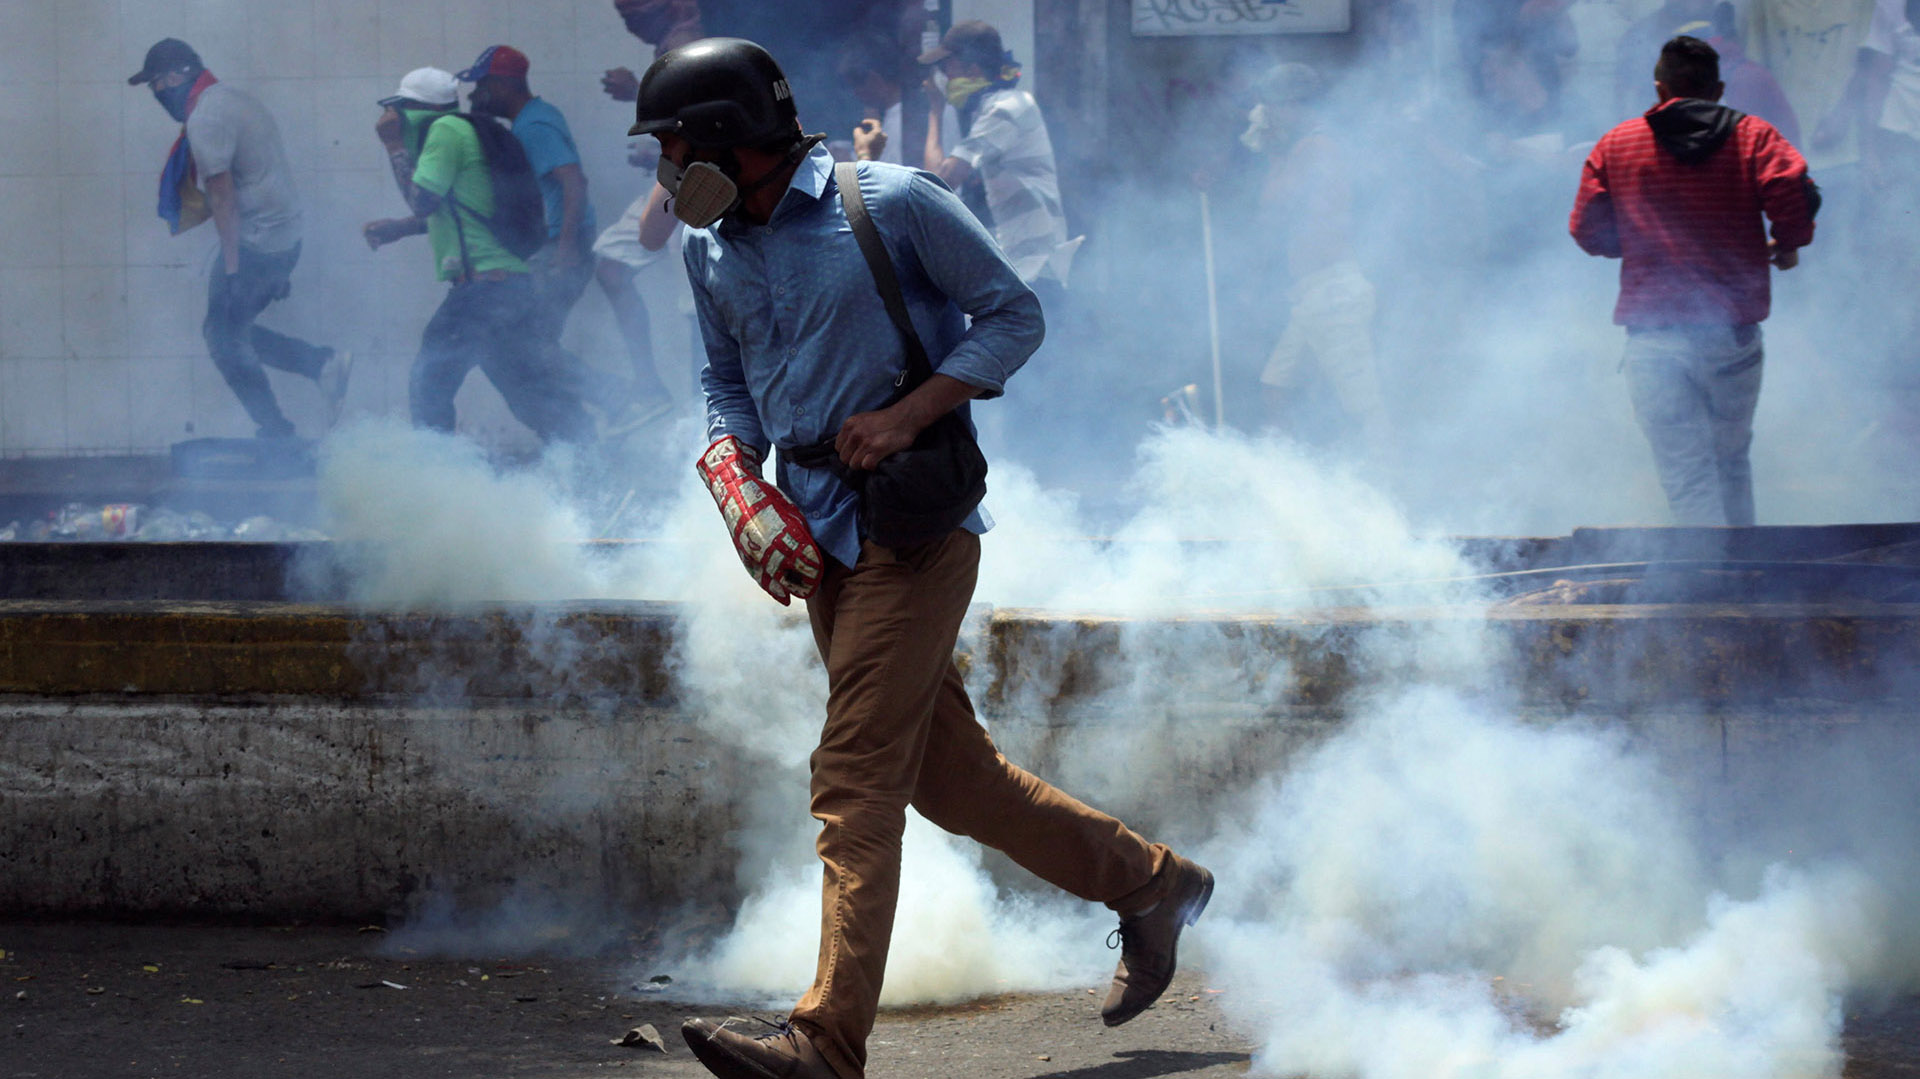 Un manifestante en San Antonio del Tachira, Venezuela, February 23, 2019. (REUTERS/Carlos Eduardo Ramirez)